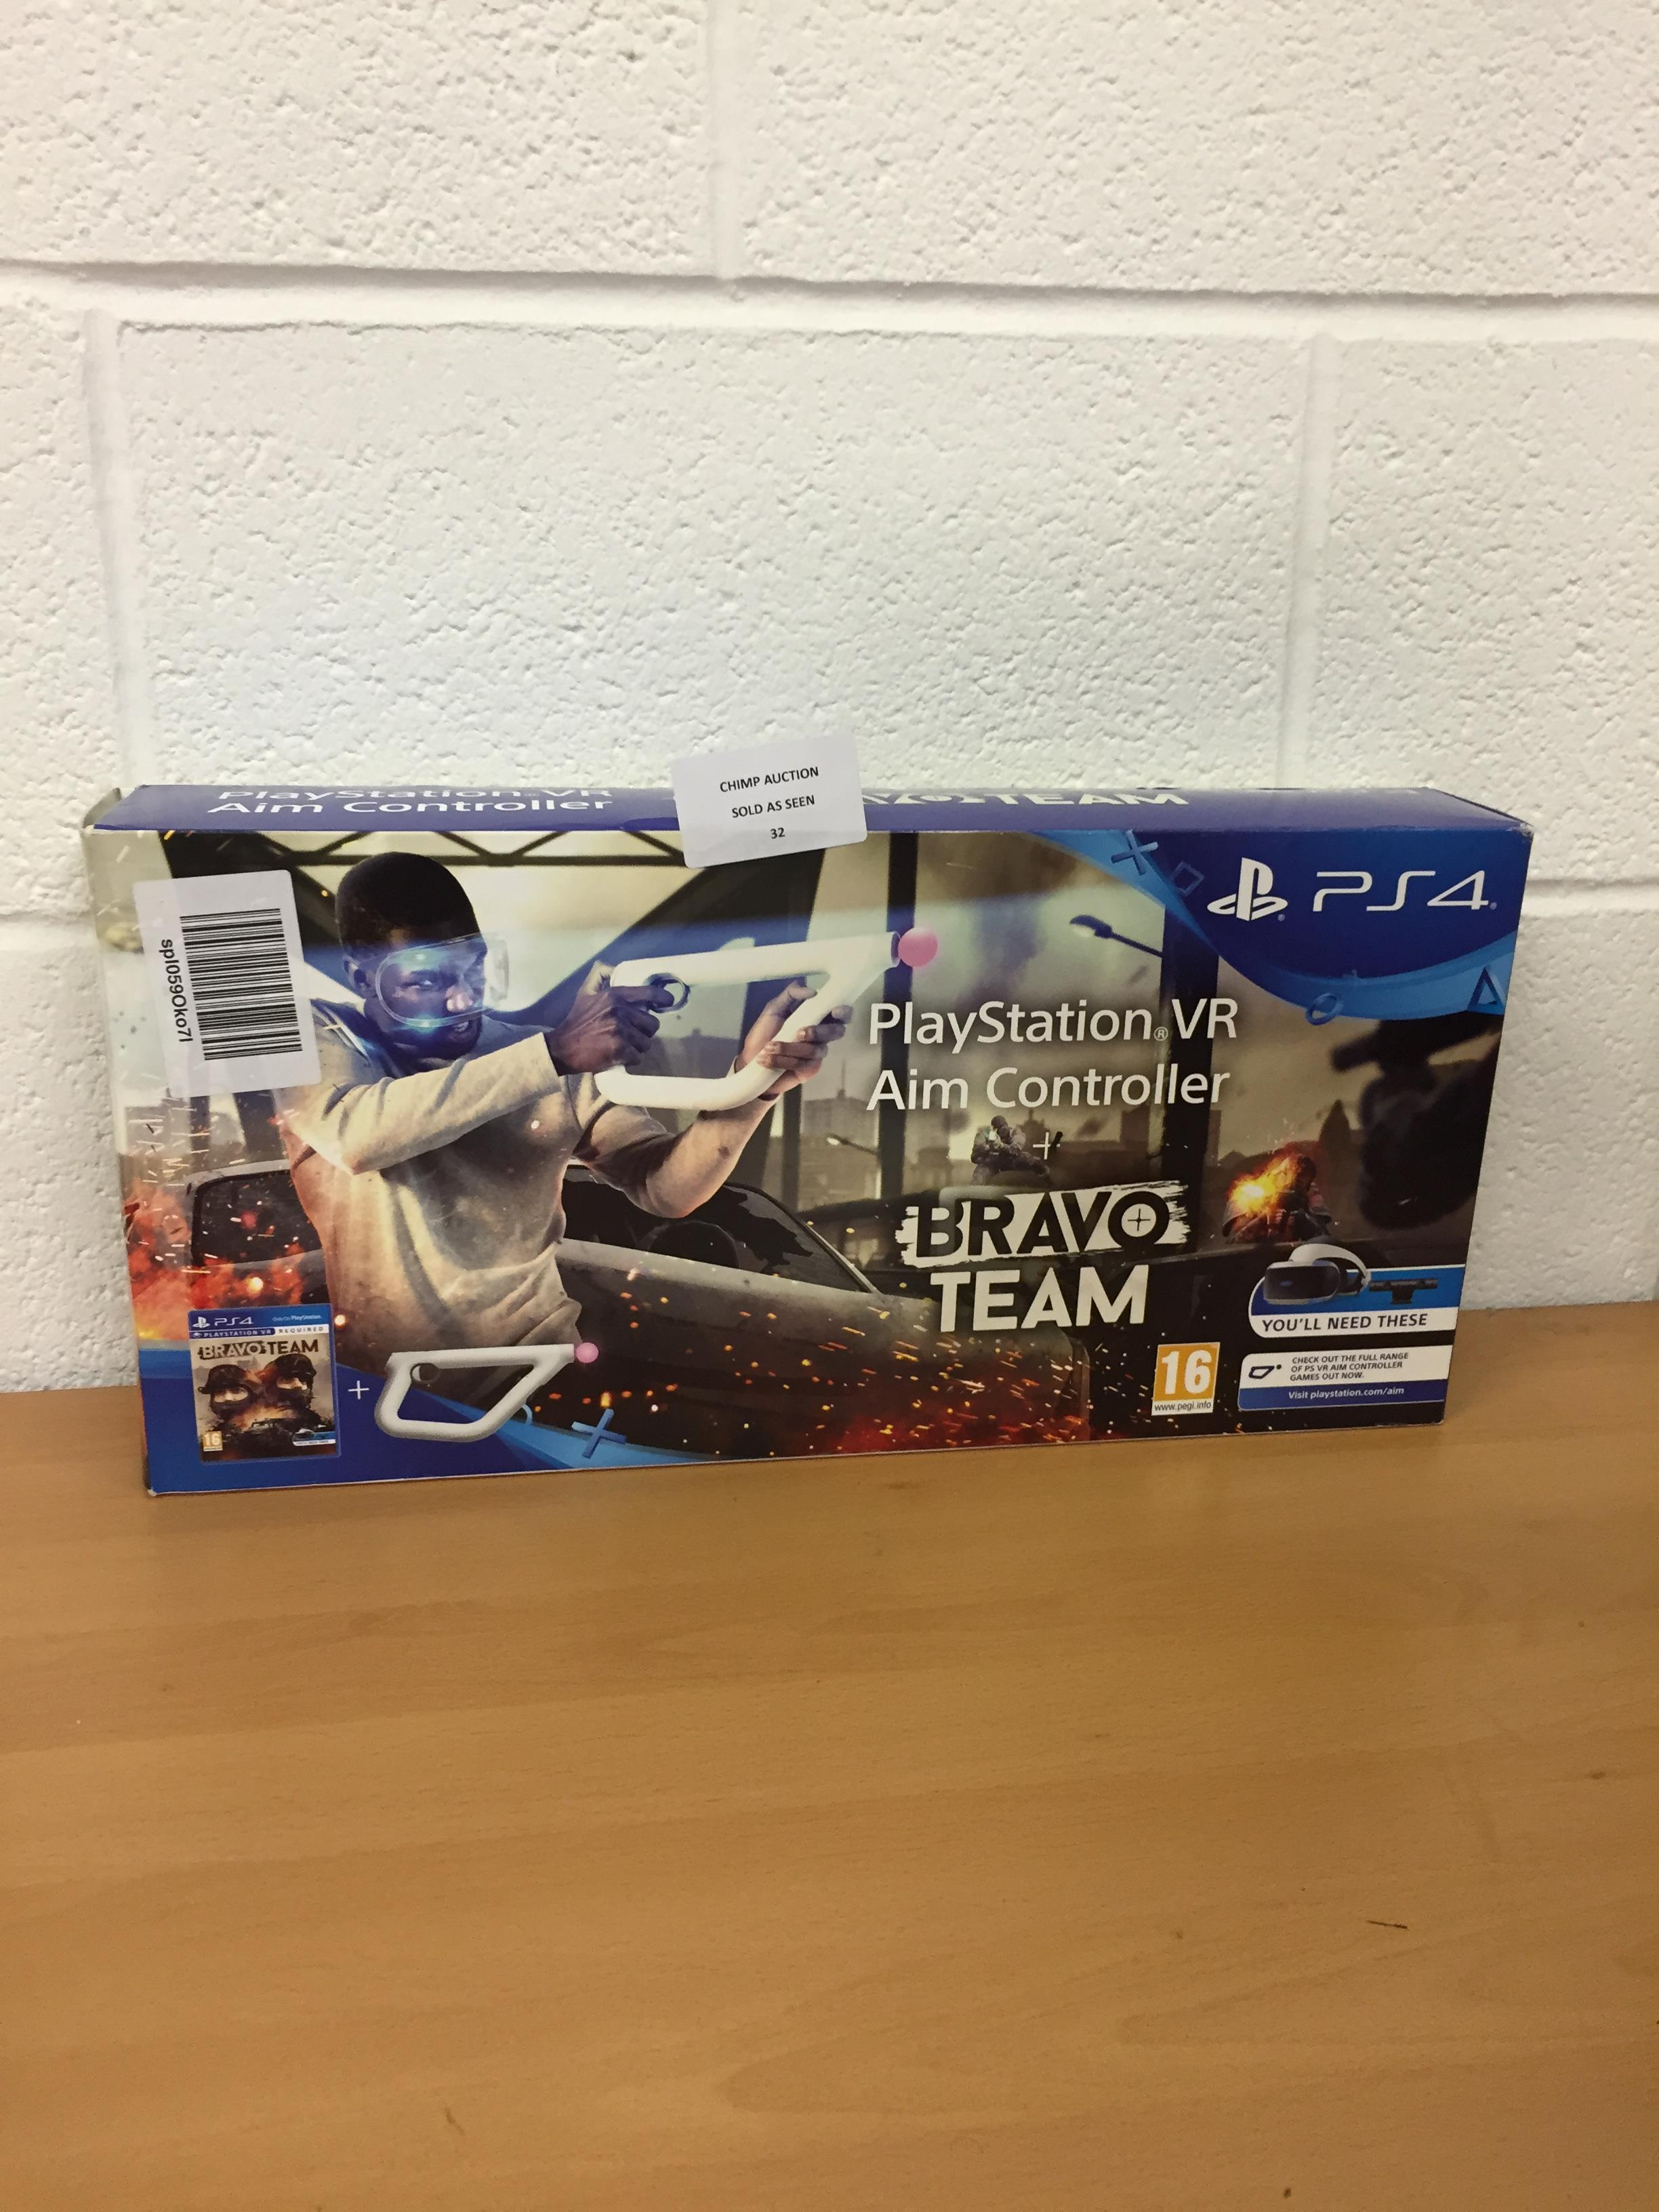 Lot 32 - Bravo Team + Aim Controller Bundle (Sony PS4 VR) RRP £119.99.